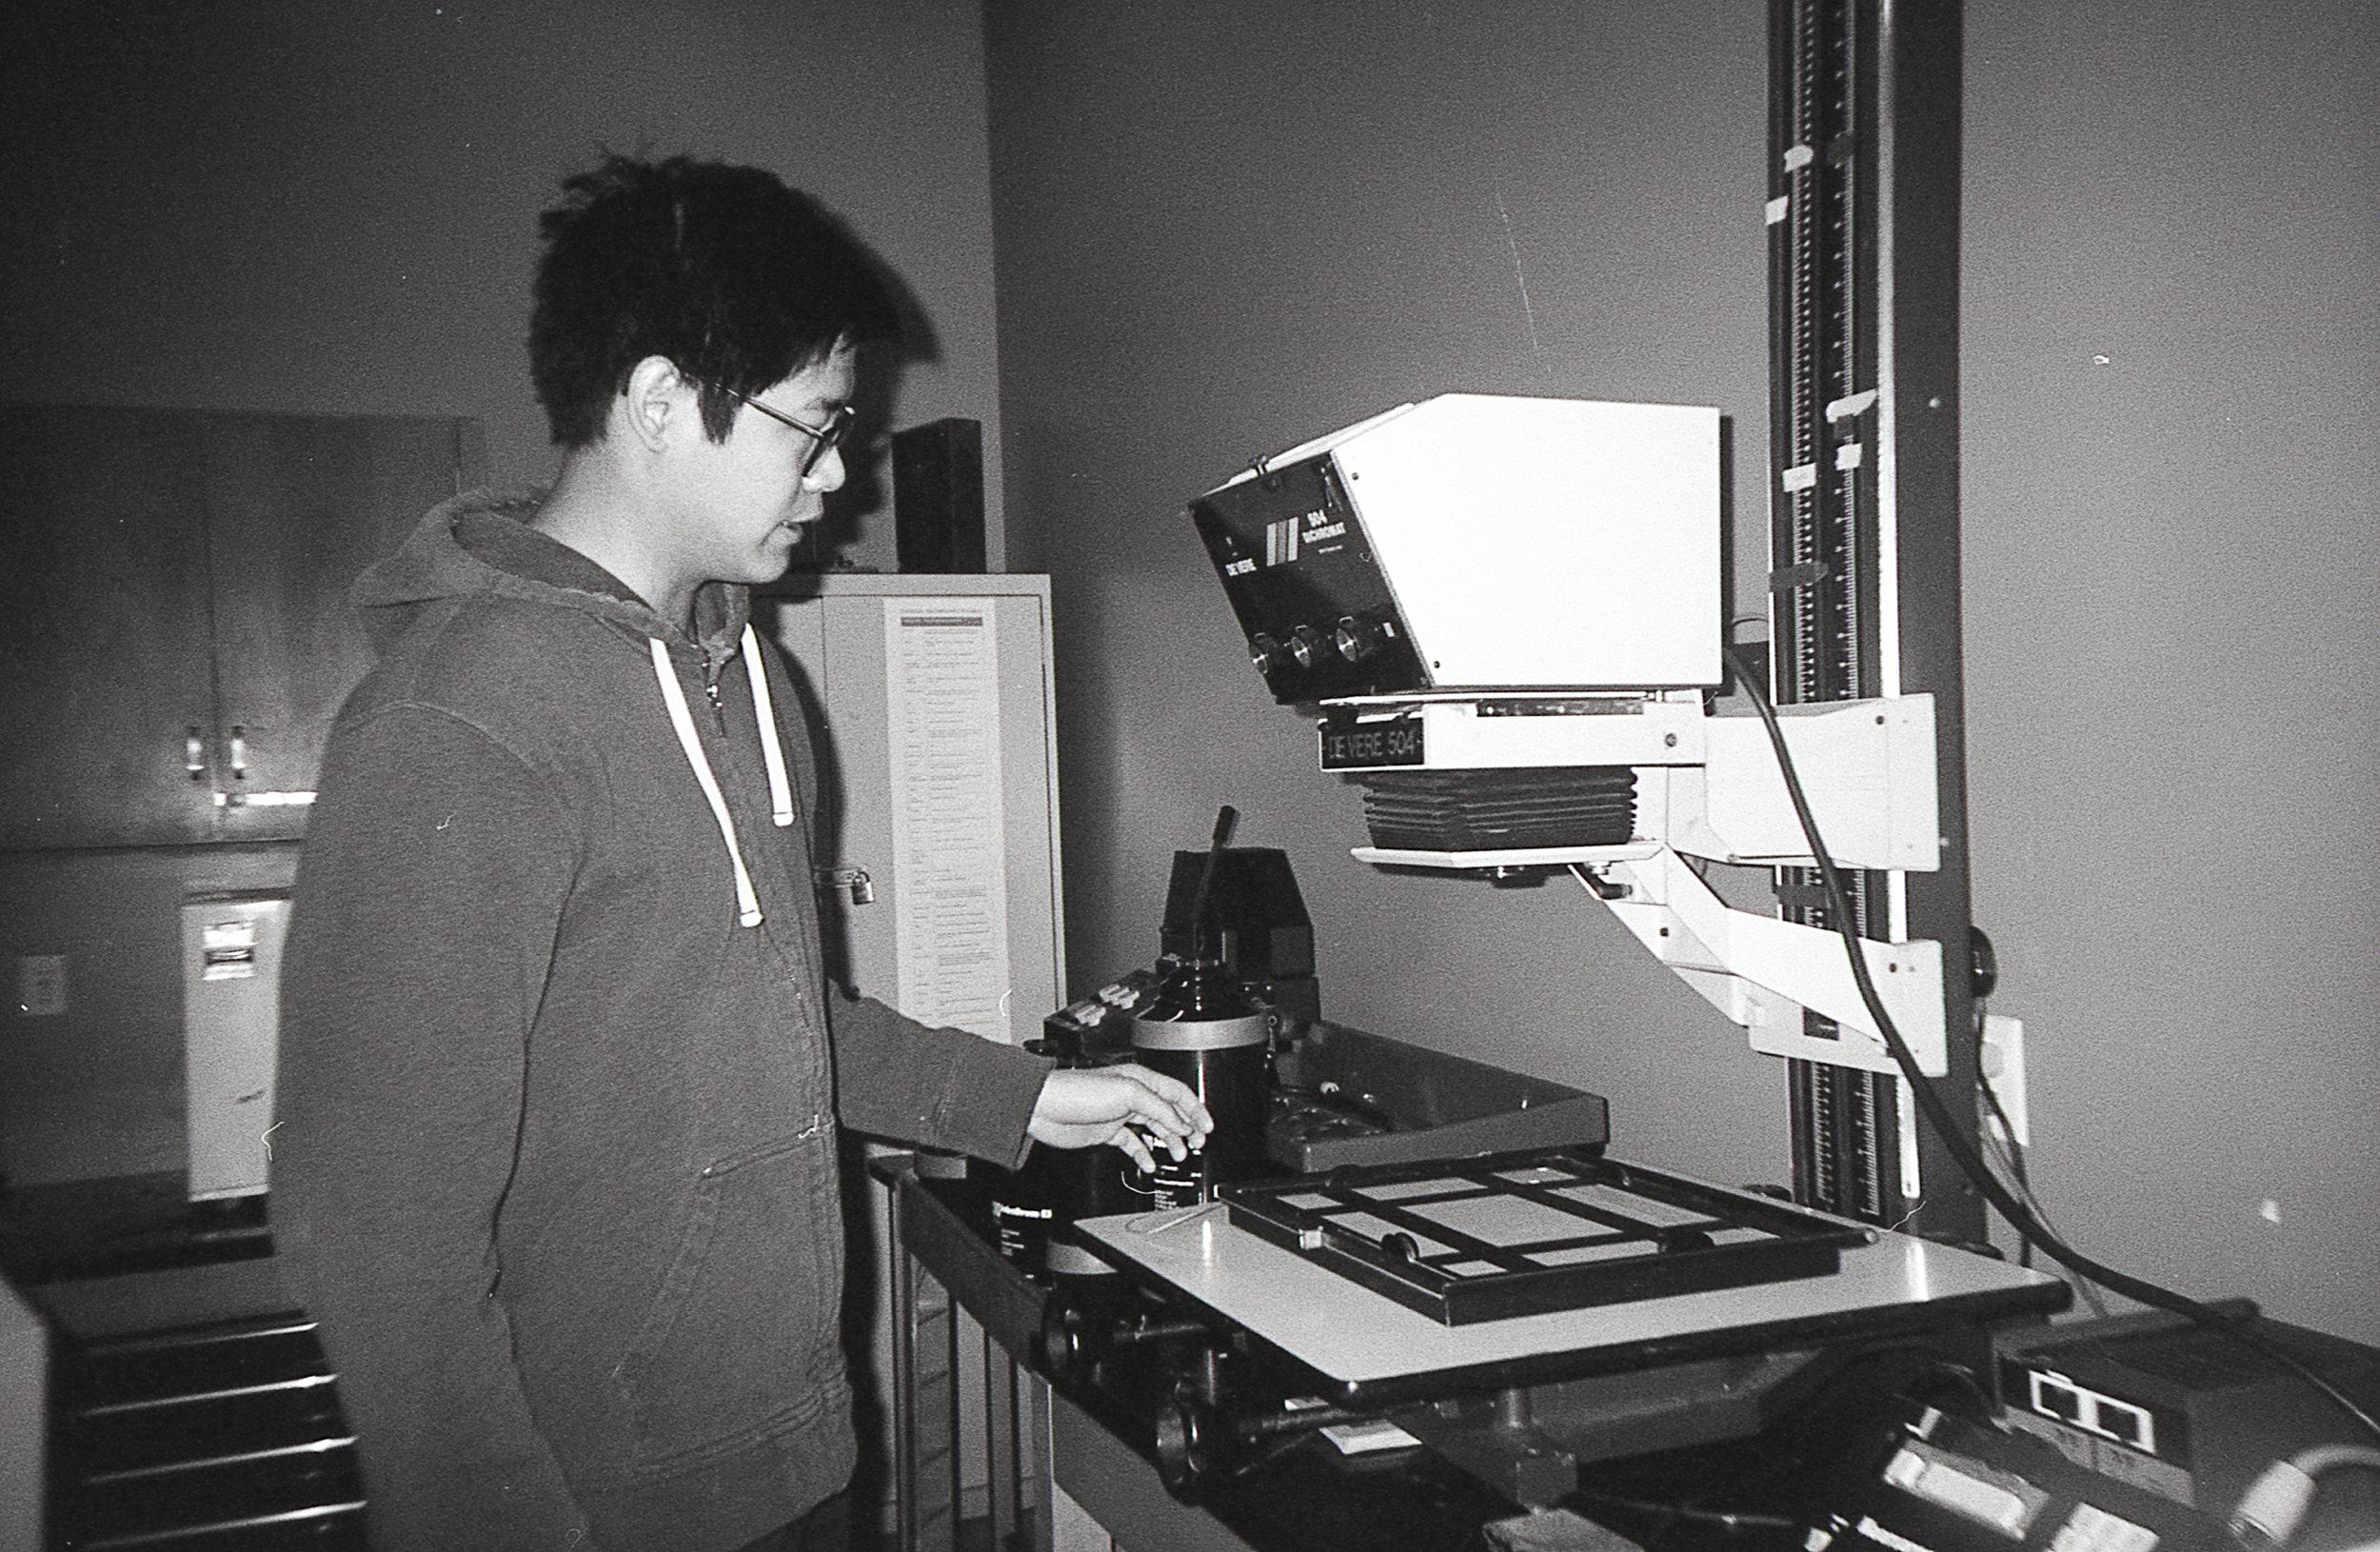 Hongen Nar in Graduate Darkroom at Ryerson School of Image Arts - Kodak Tri-X 400